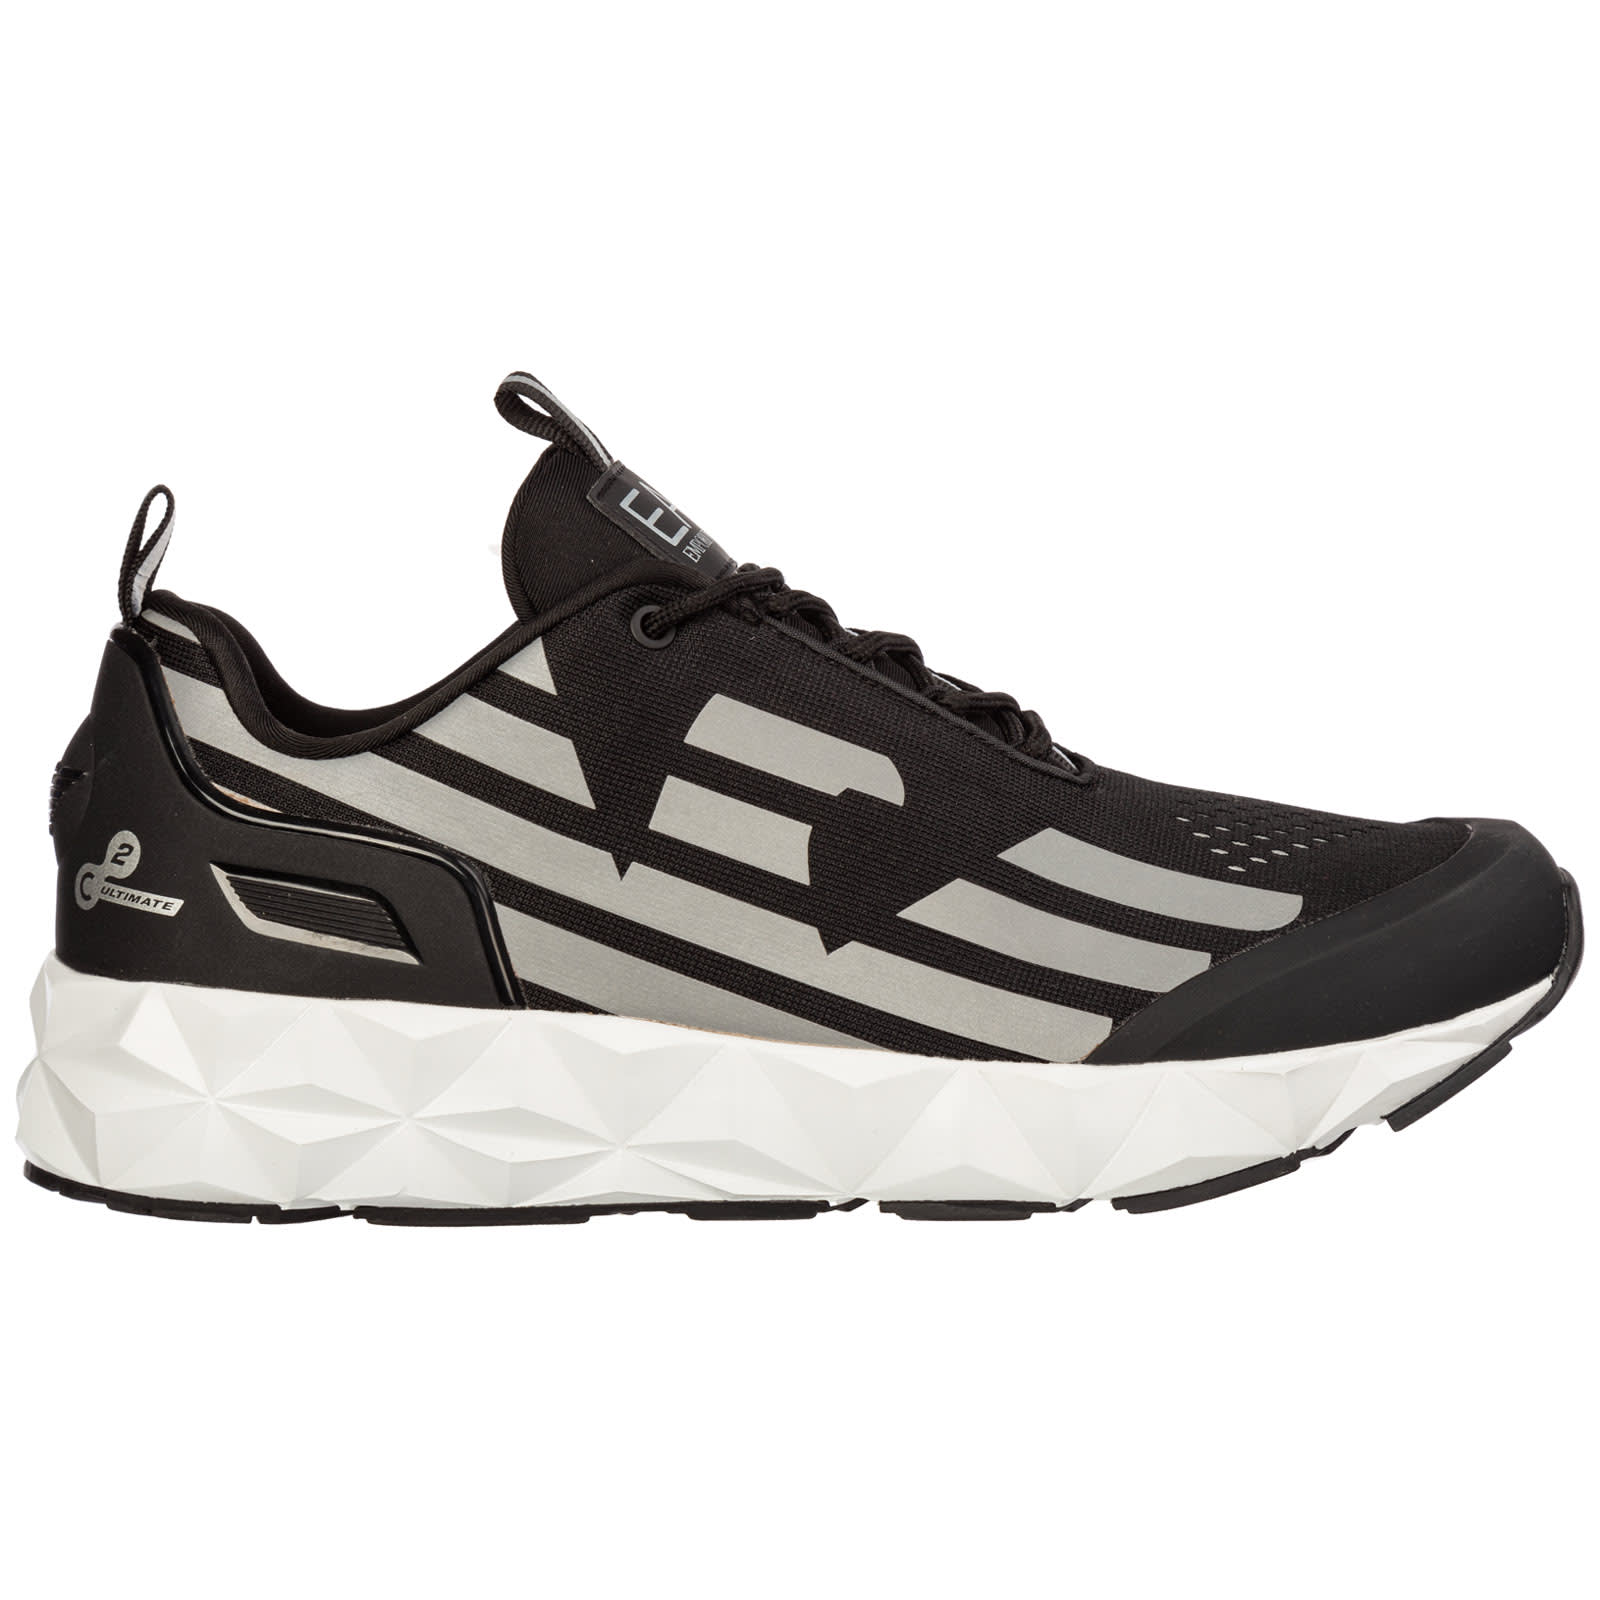 C2 Ultimate Sneakers